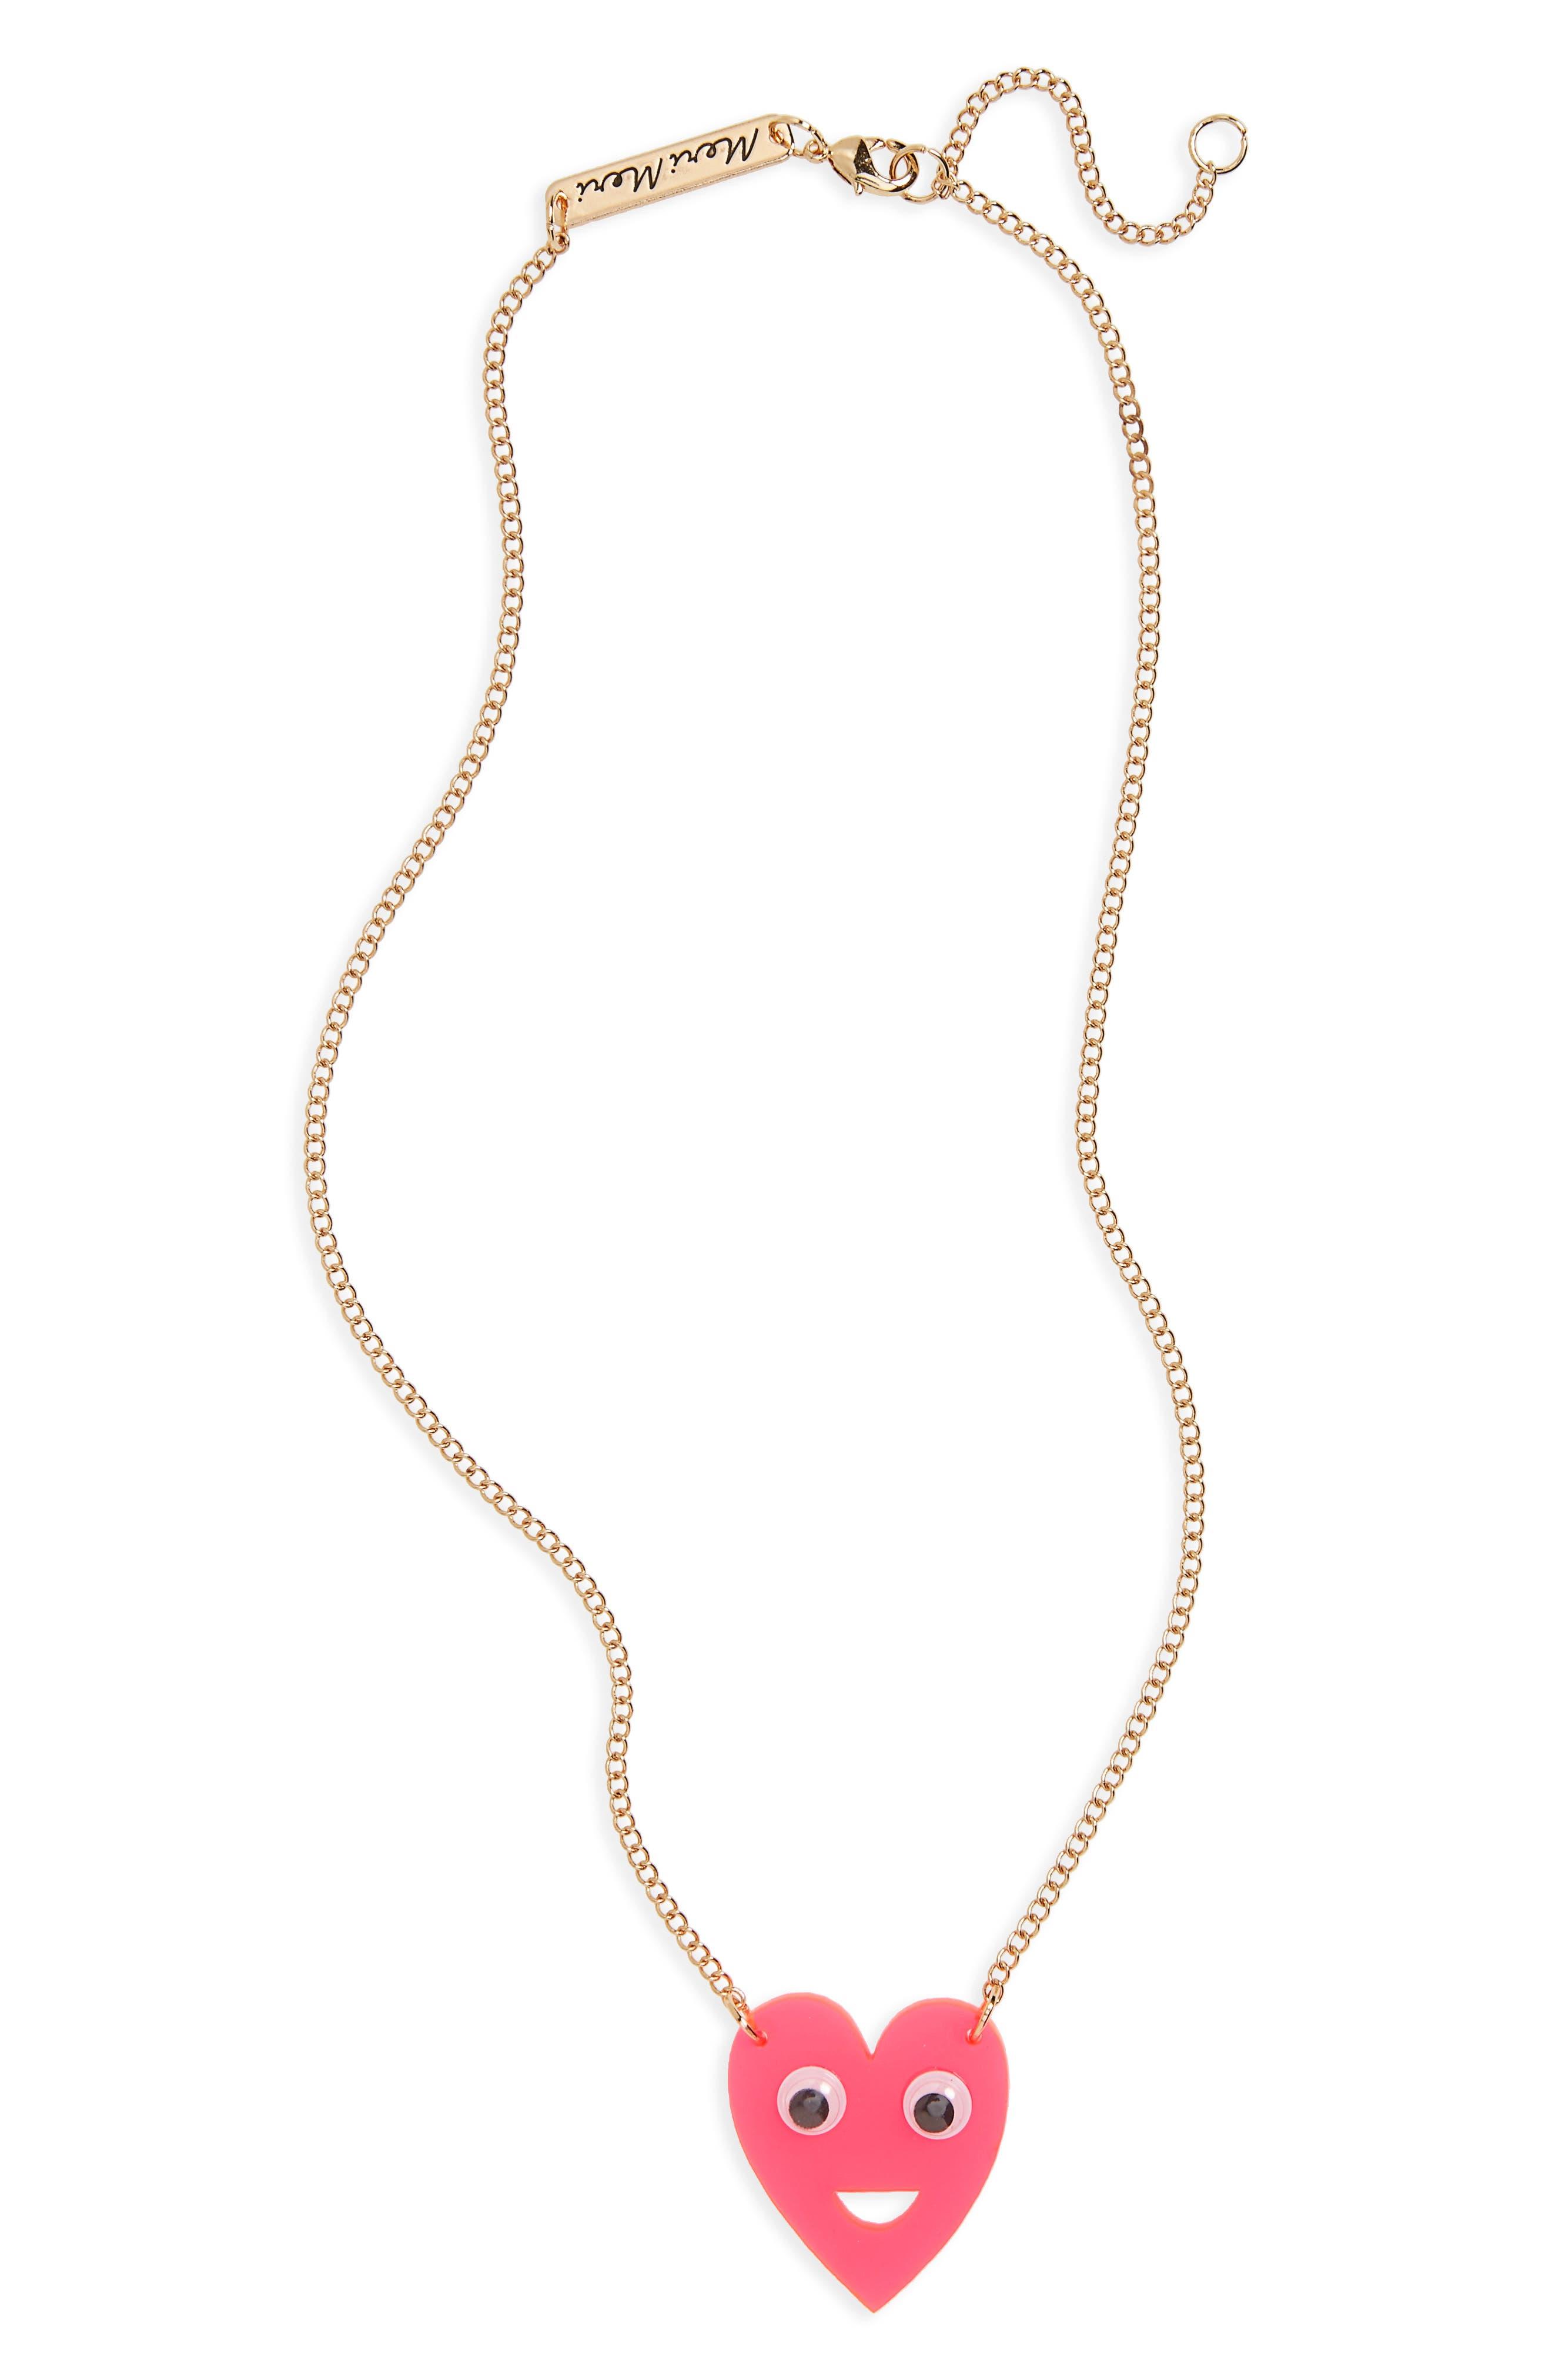 Alternate Image 1 Selected - Meri Meri Heart with Eyes Pendant Necklace (Girls)